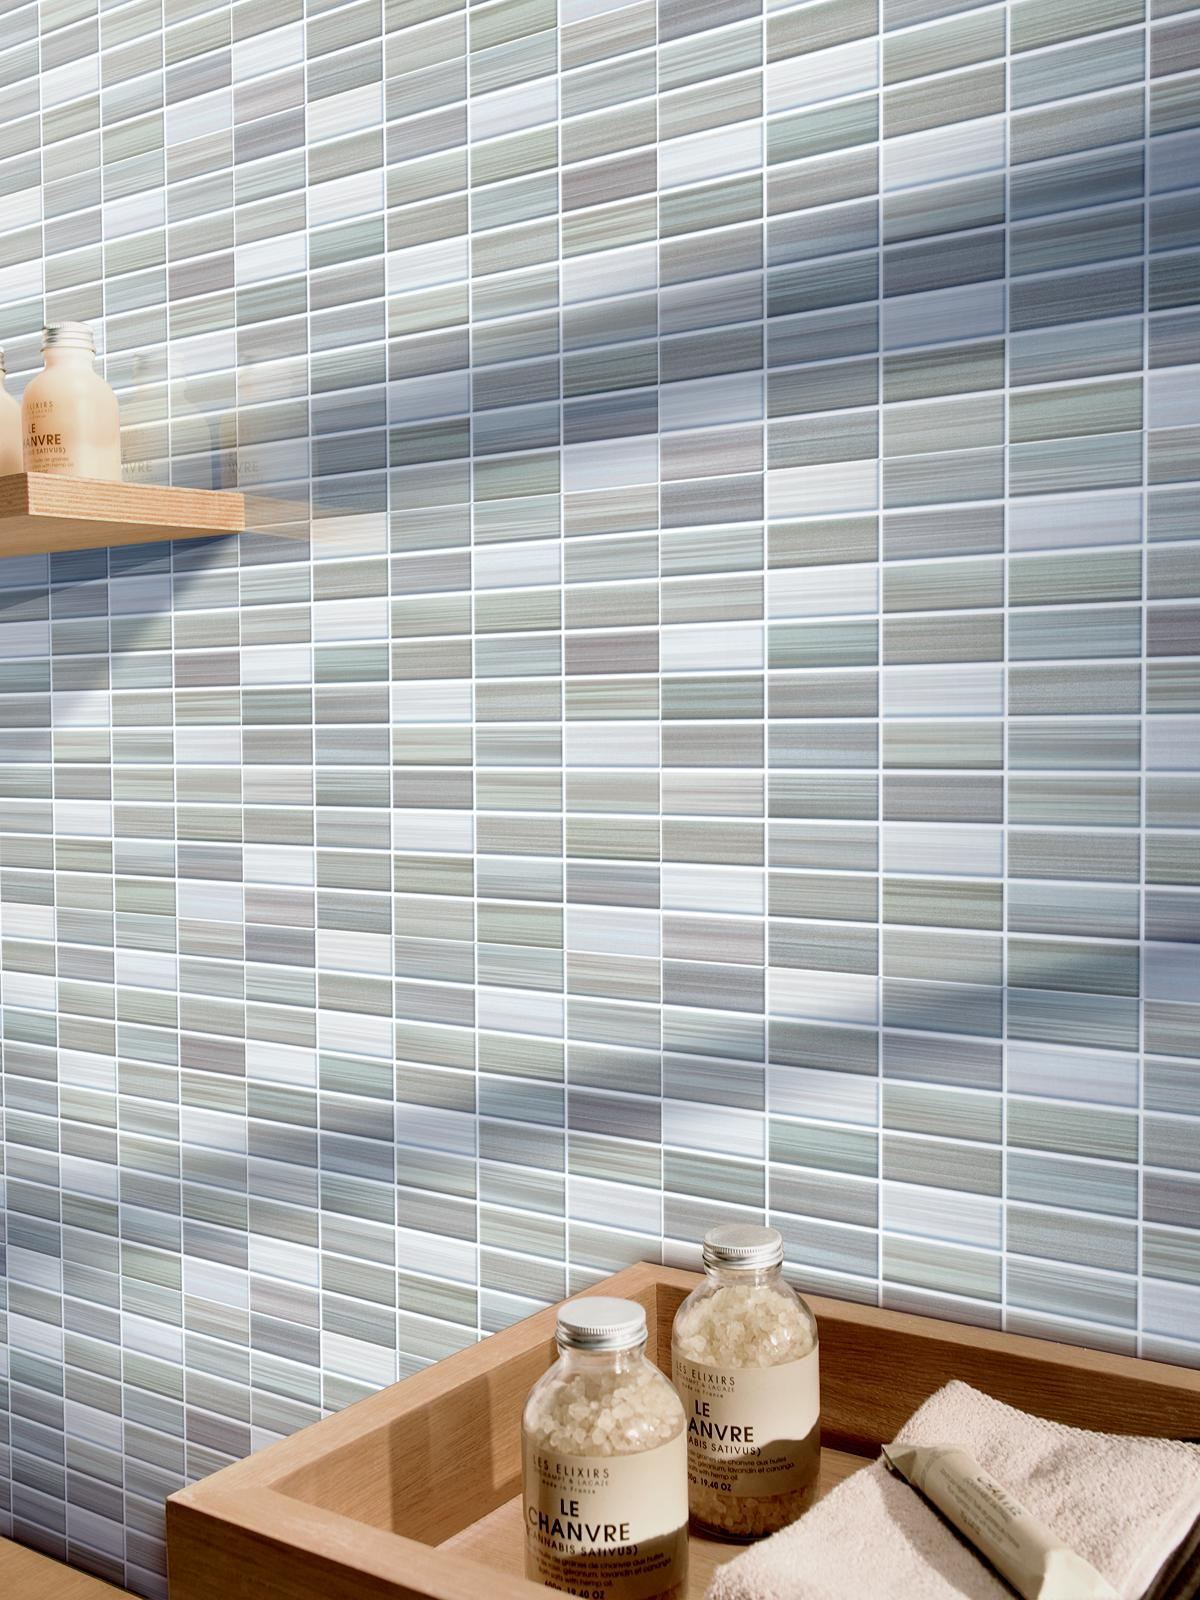 Bits gres porcellanato effetto mosaico marazzi - Leroy merlin piastrelle mosaico ...